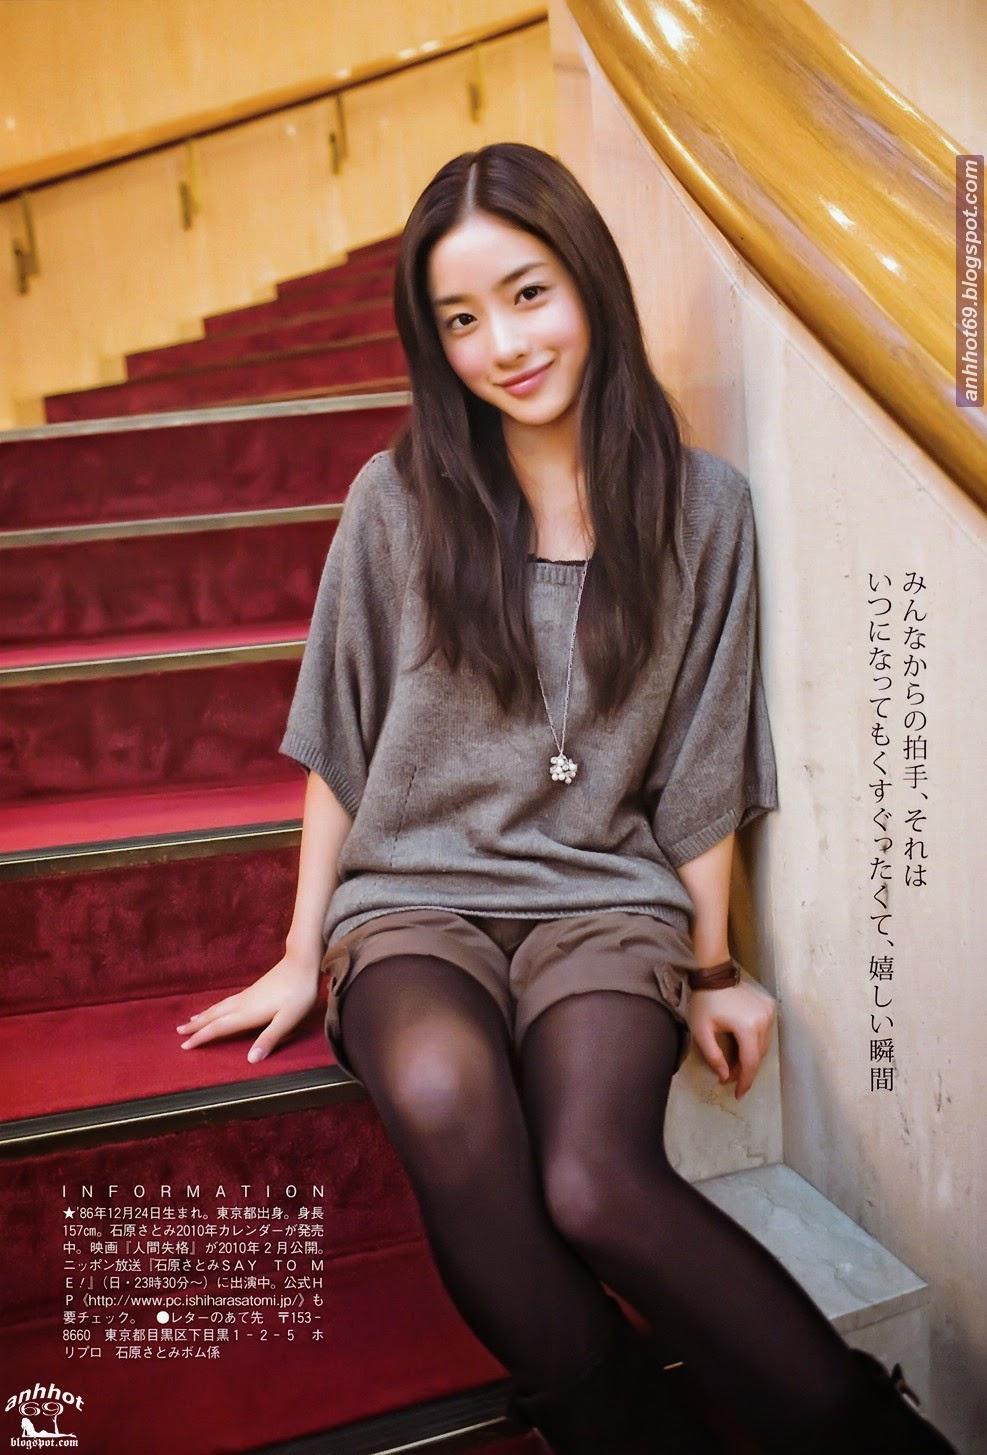 satomi-ishihara-00523519